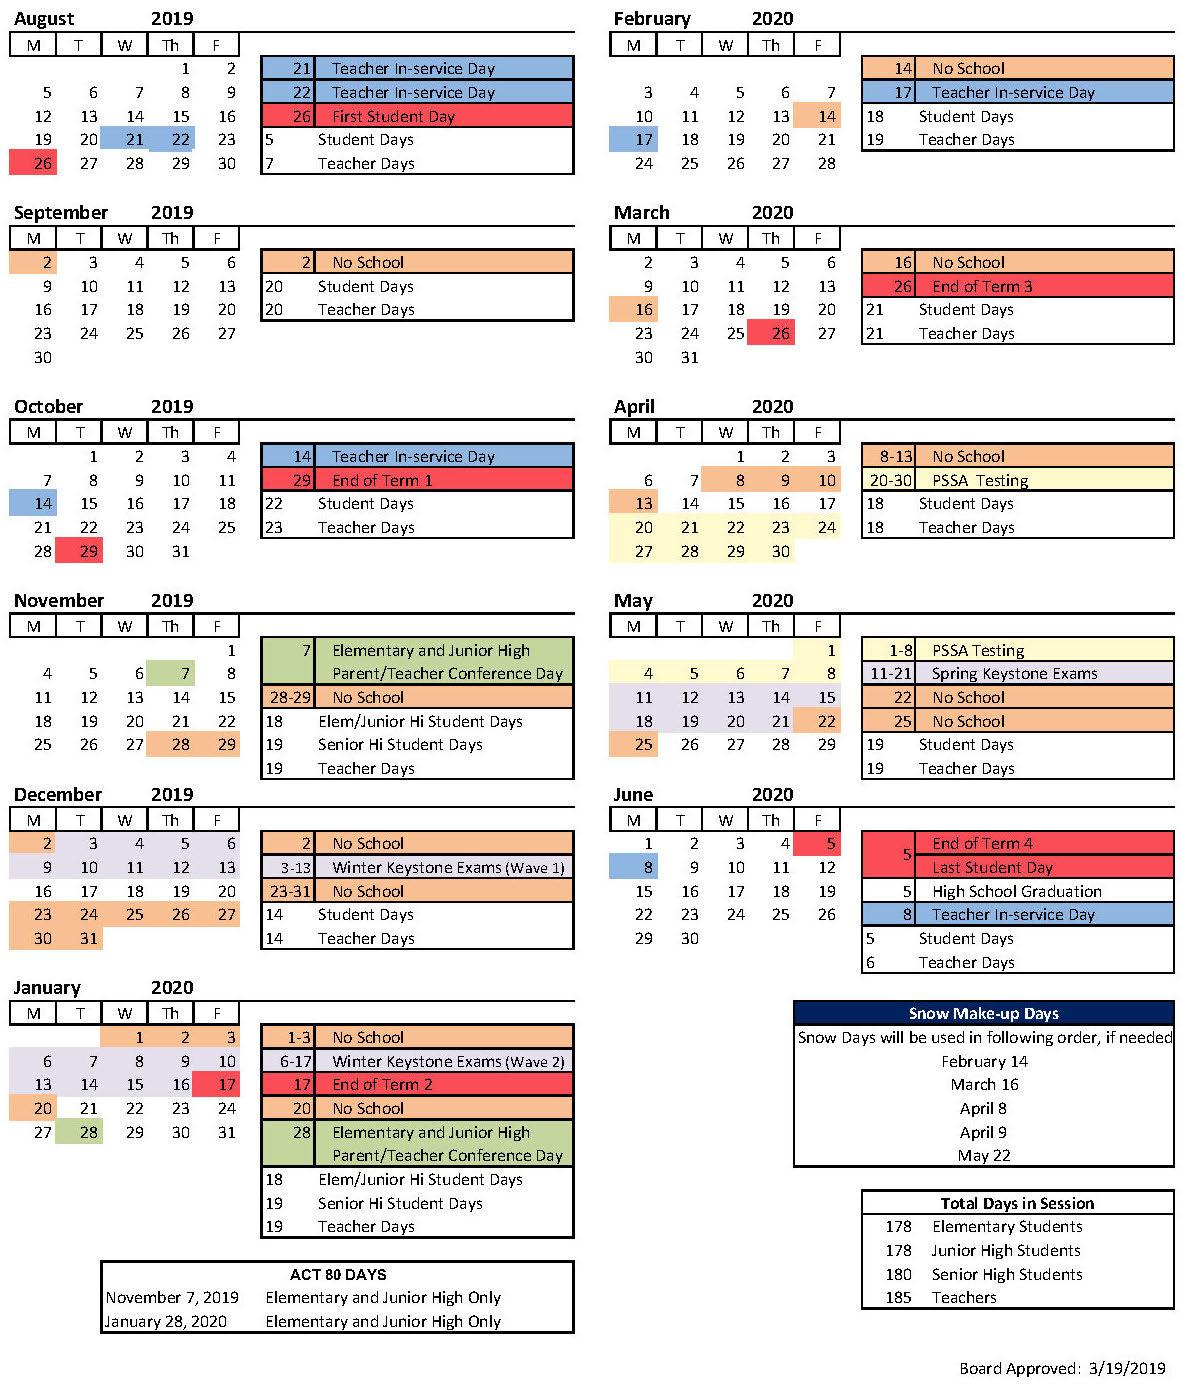 School Year Calendar - Iroquois School District